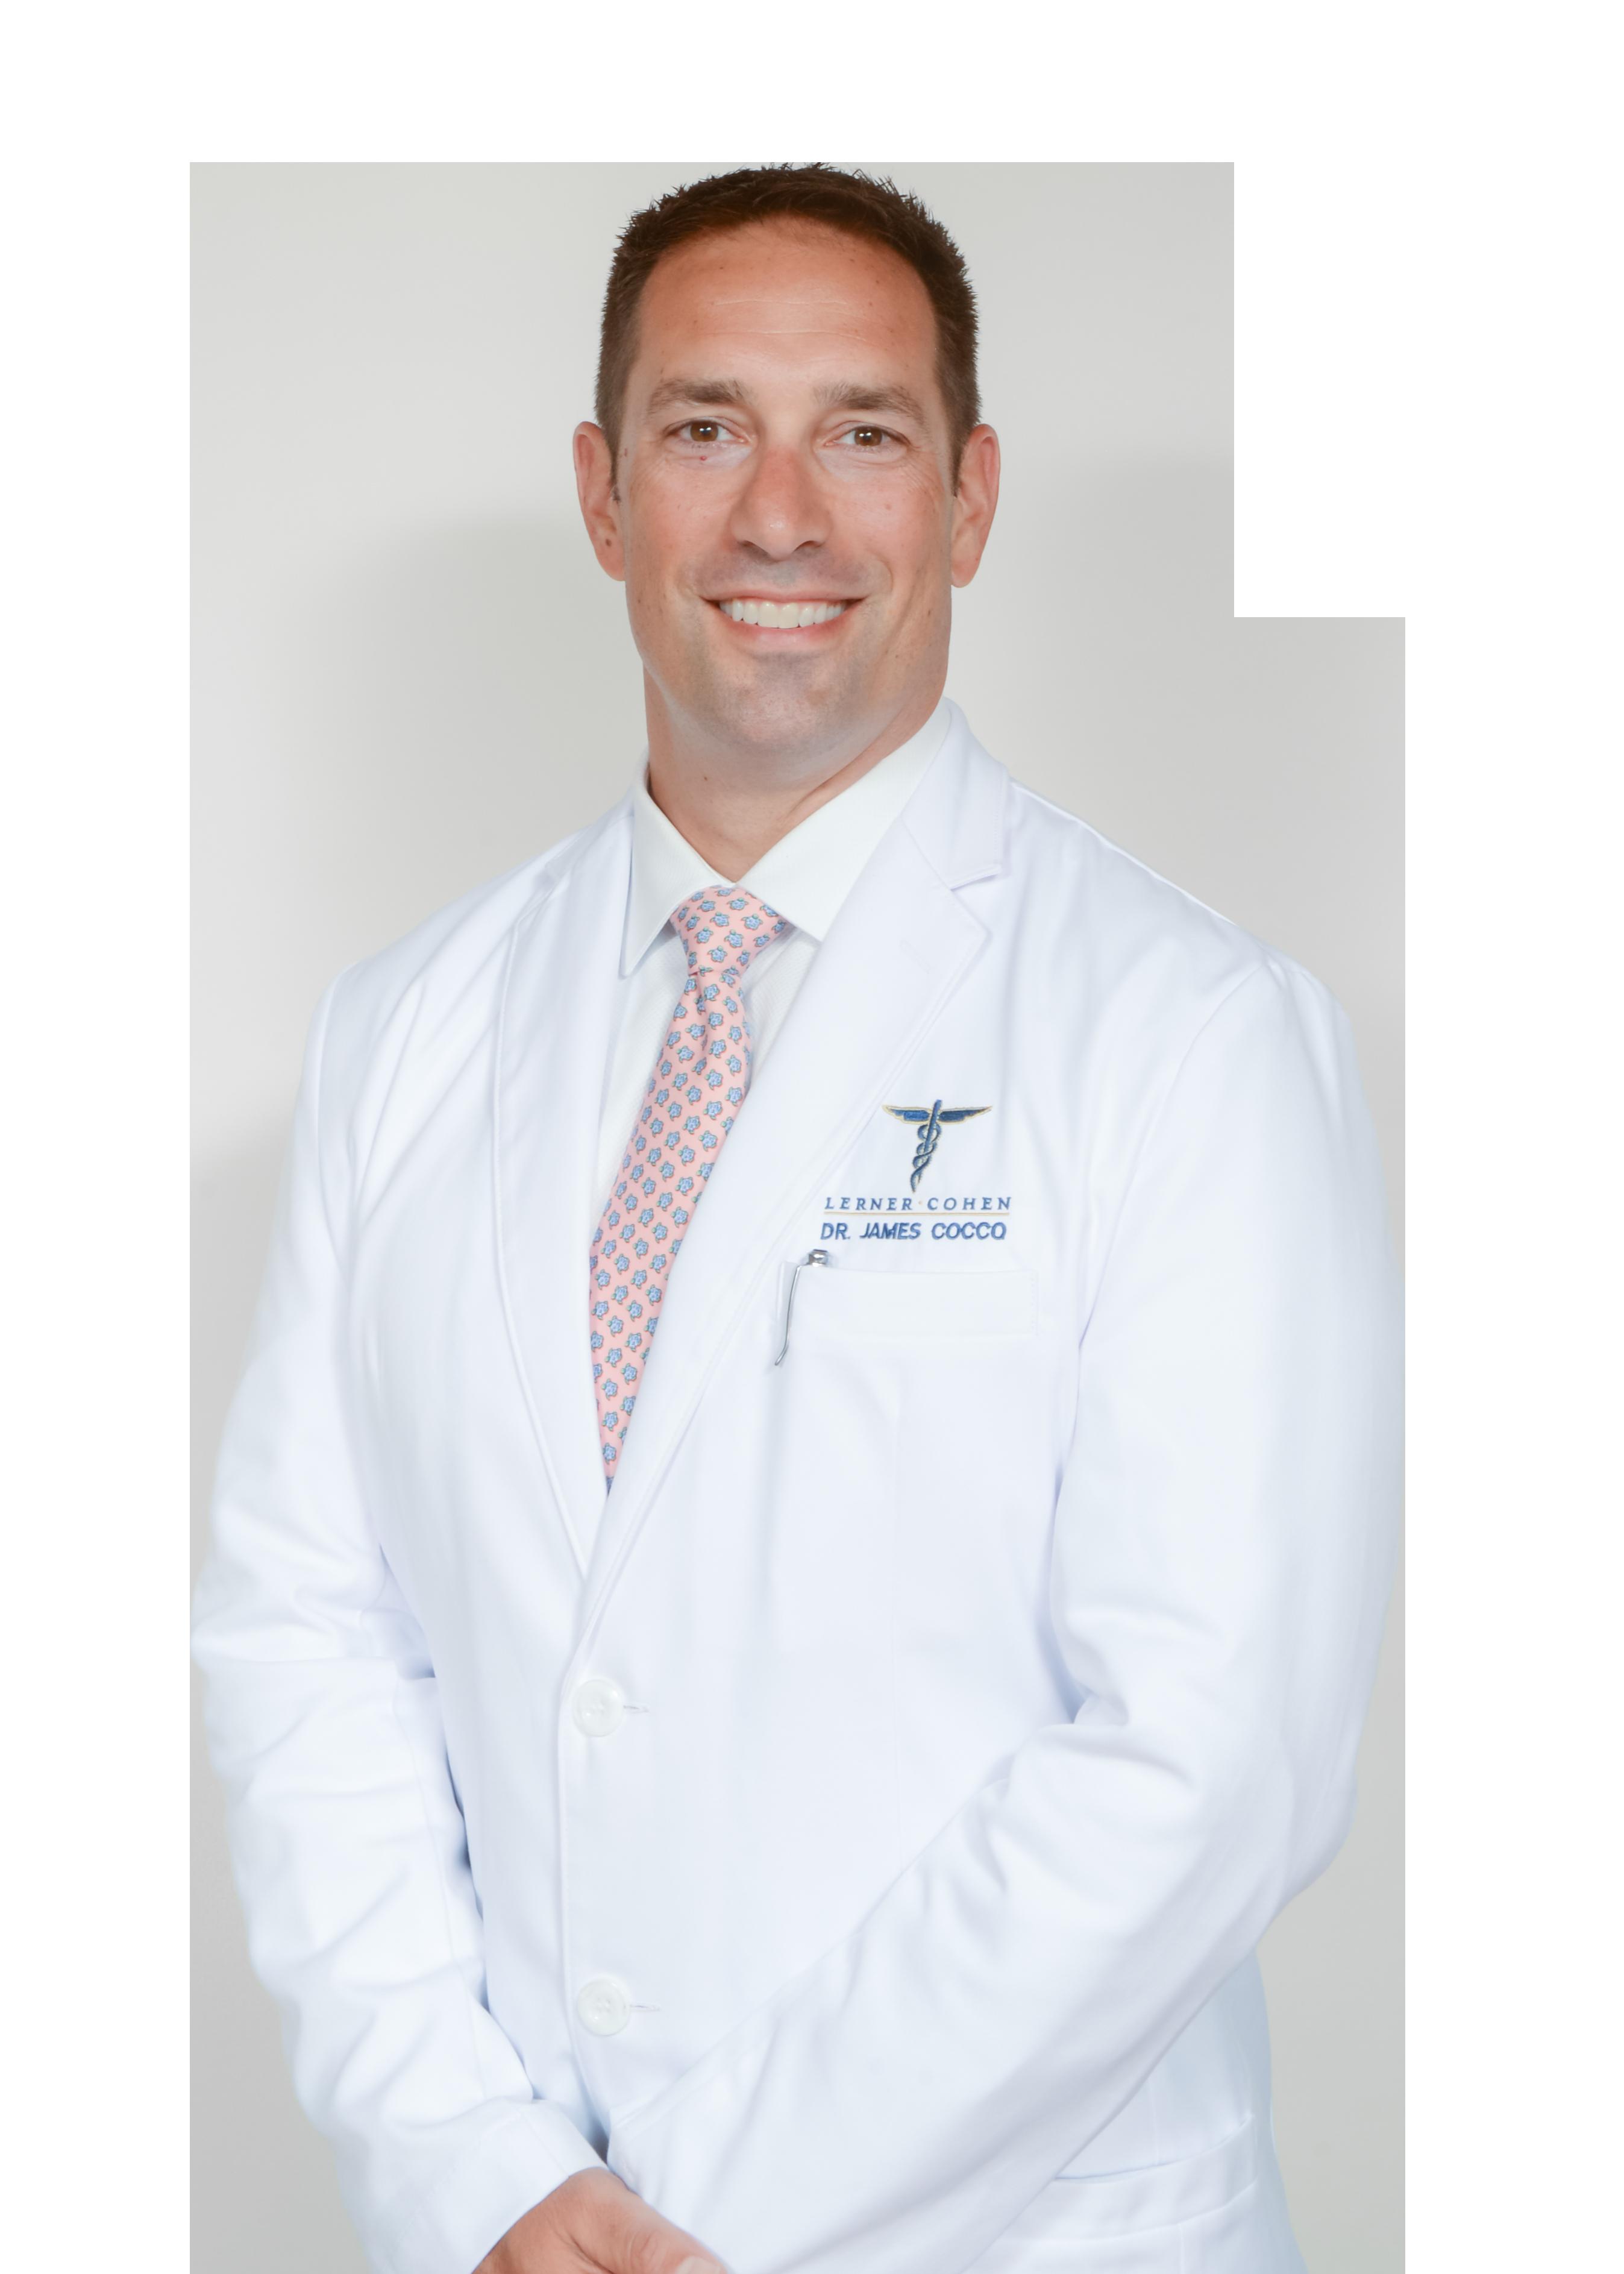 DR. JAMES R. COCCO BOARD-CERTIFIED IN INTERNAL MEDICINE & PEDIATRICS